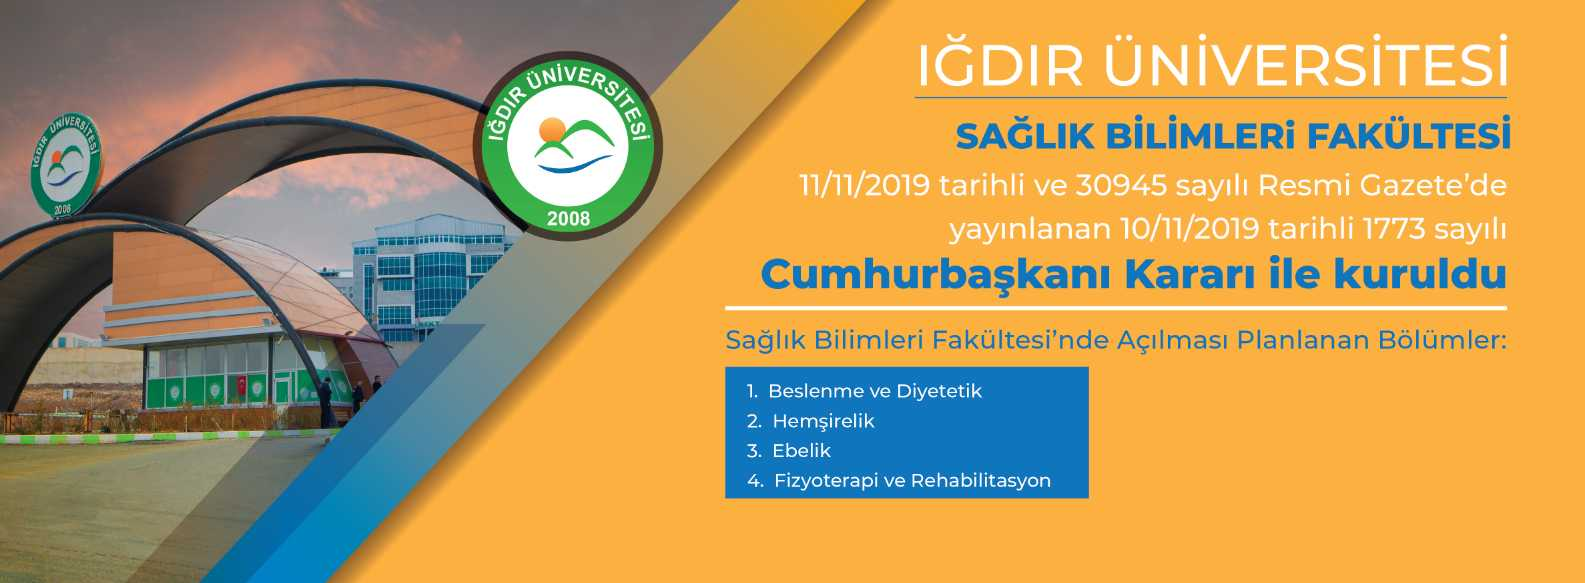 11-11-2019-saglik-bilimler-fakultesi-banner-02.jpg